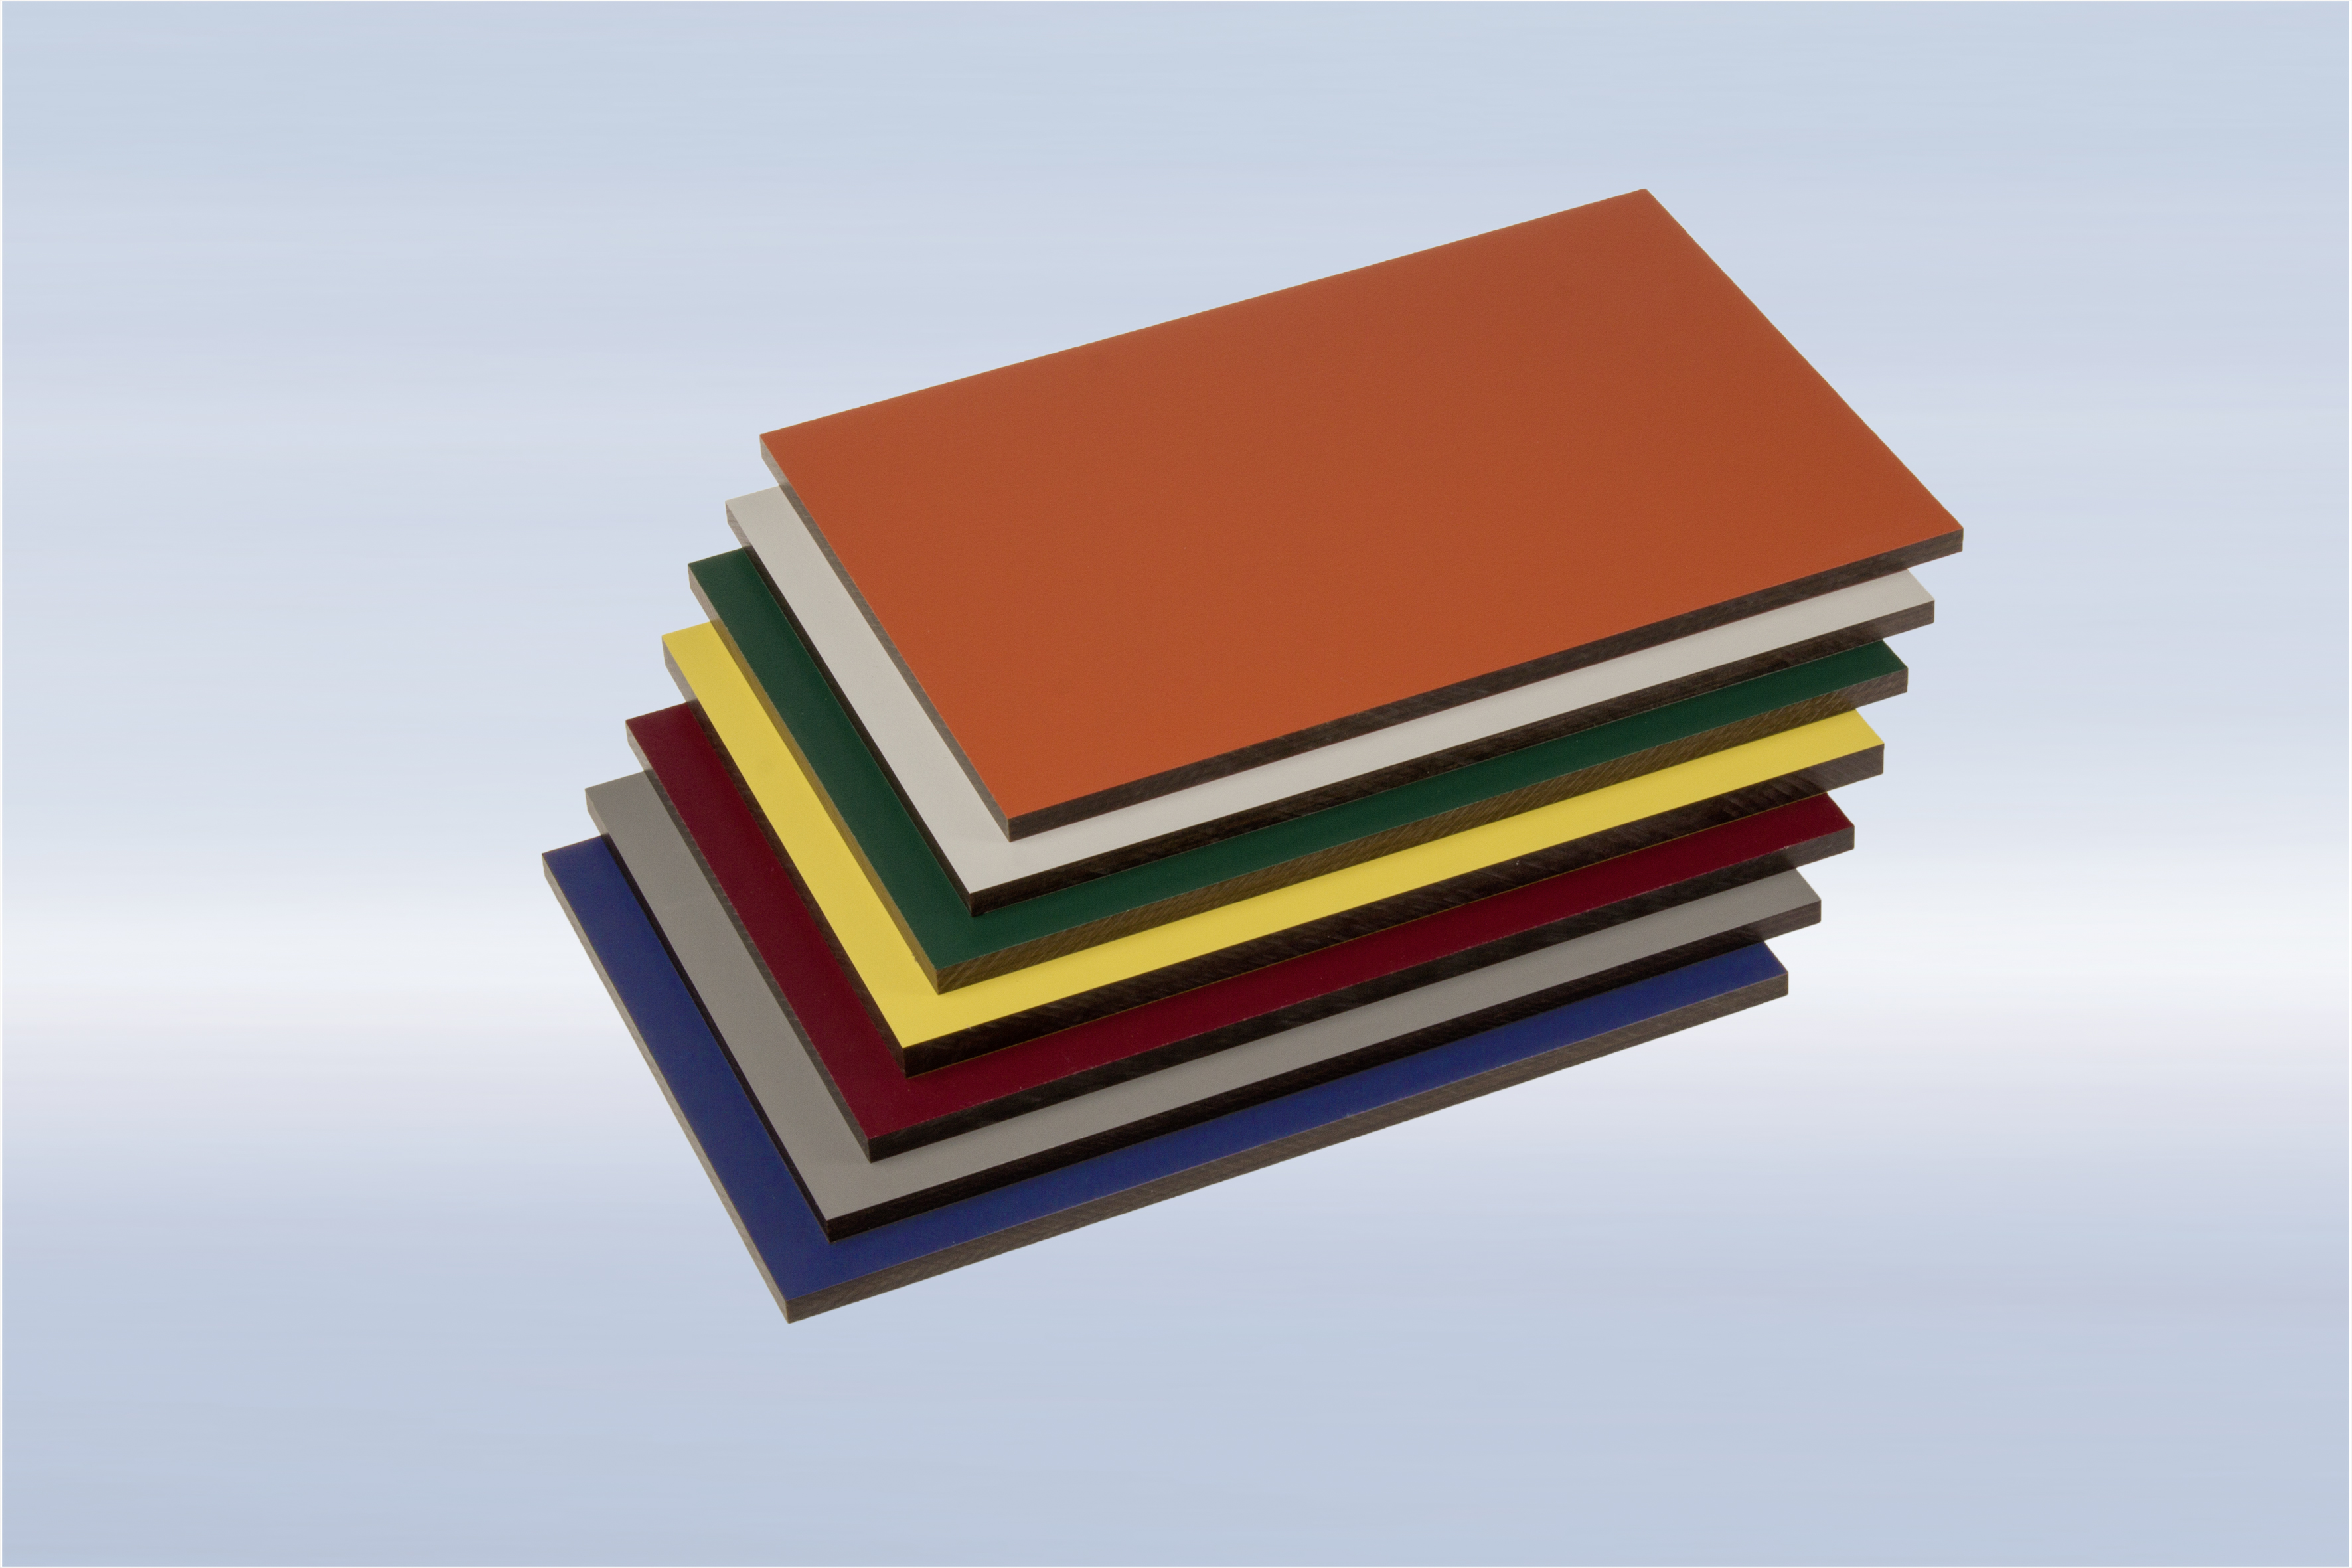 8 Mm Hpl Schichtstoffplatten Kronoart B2 Online Kaufen